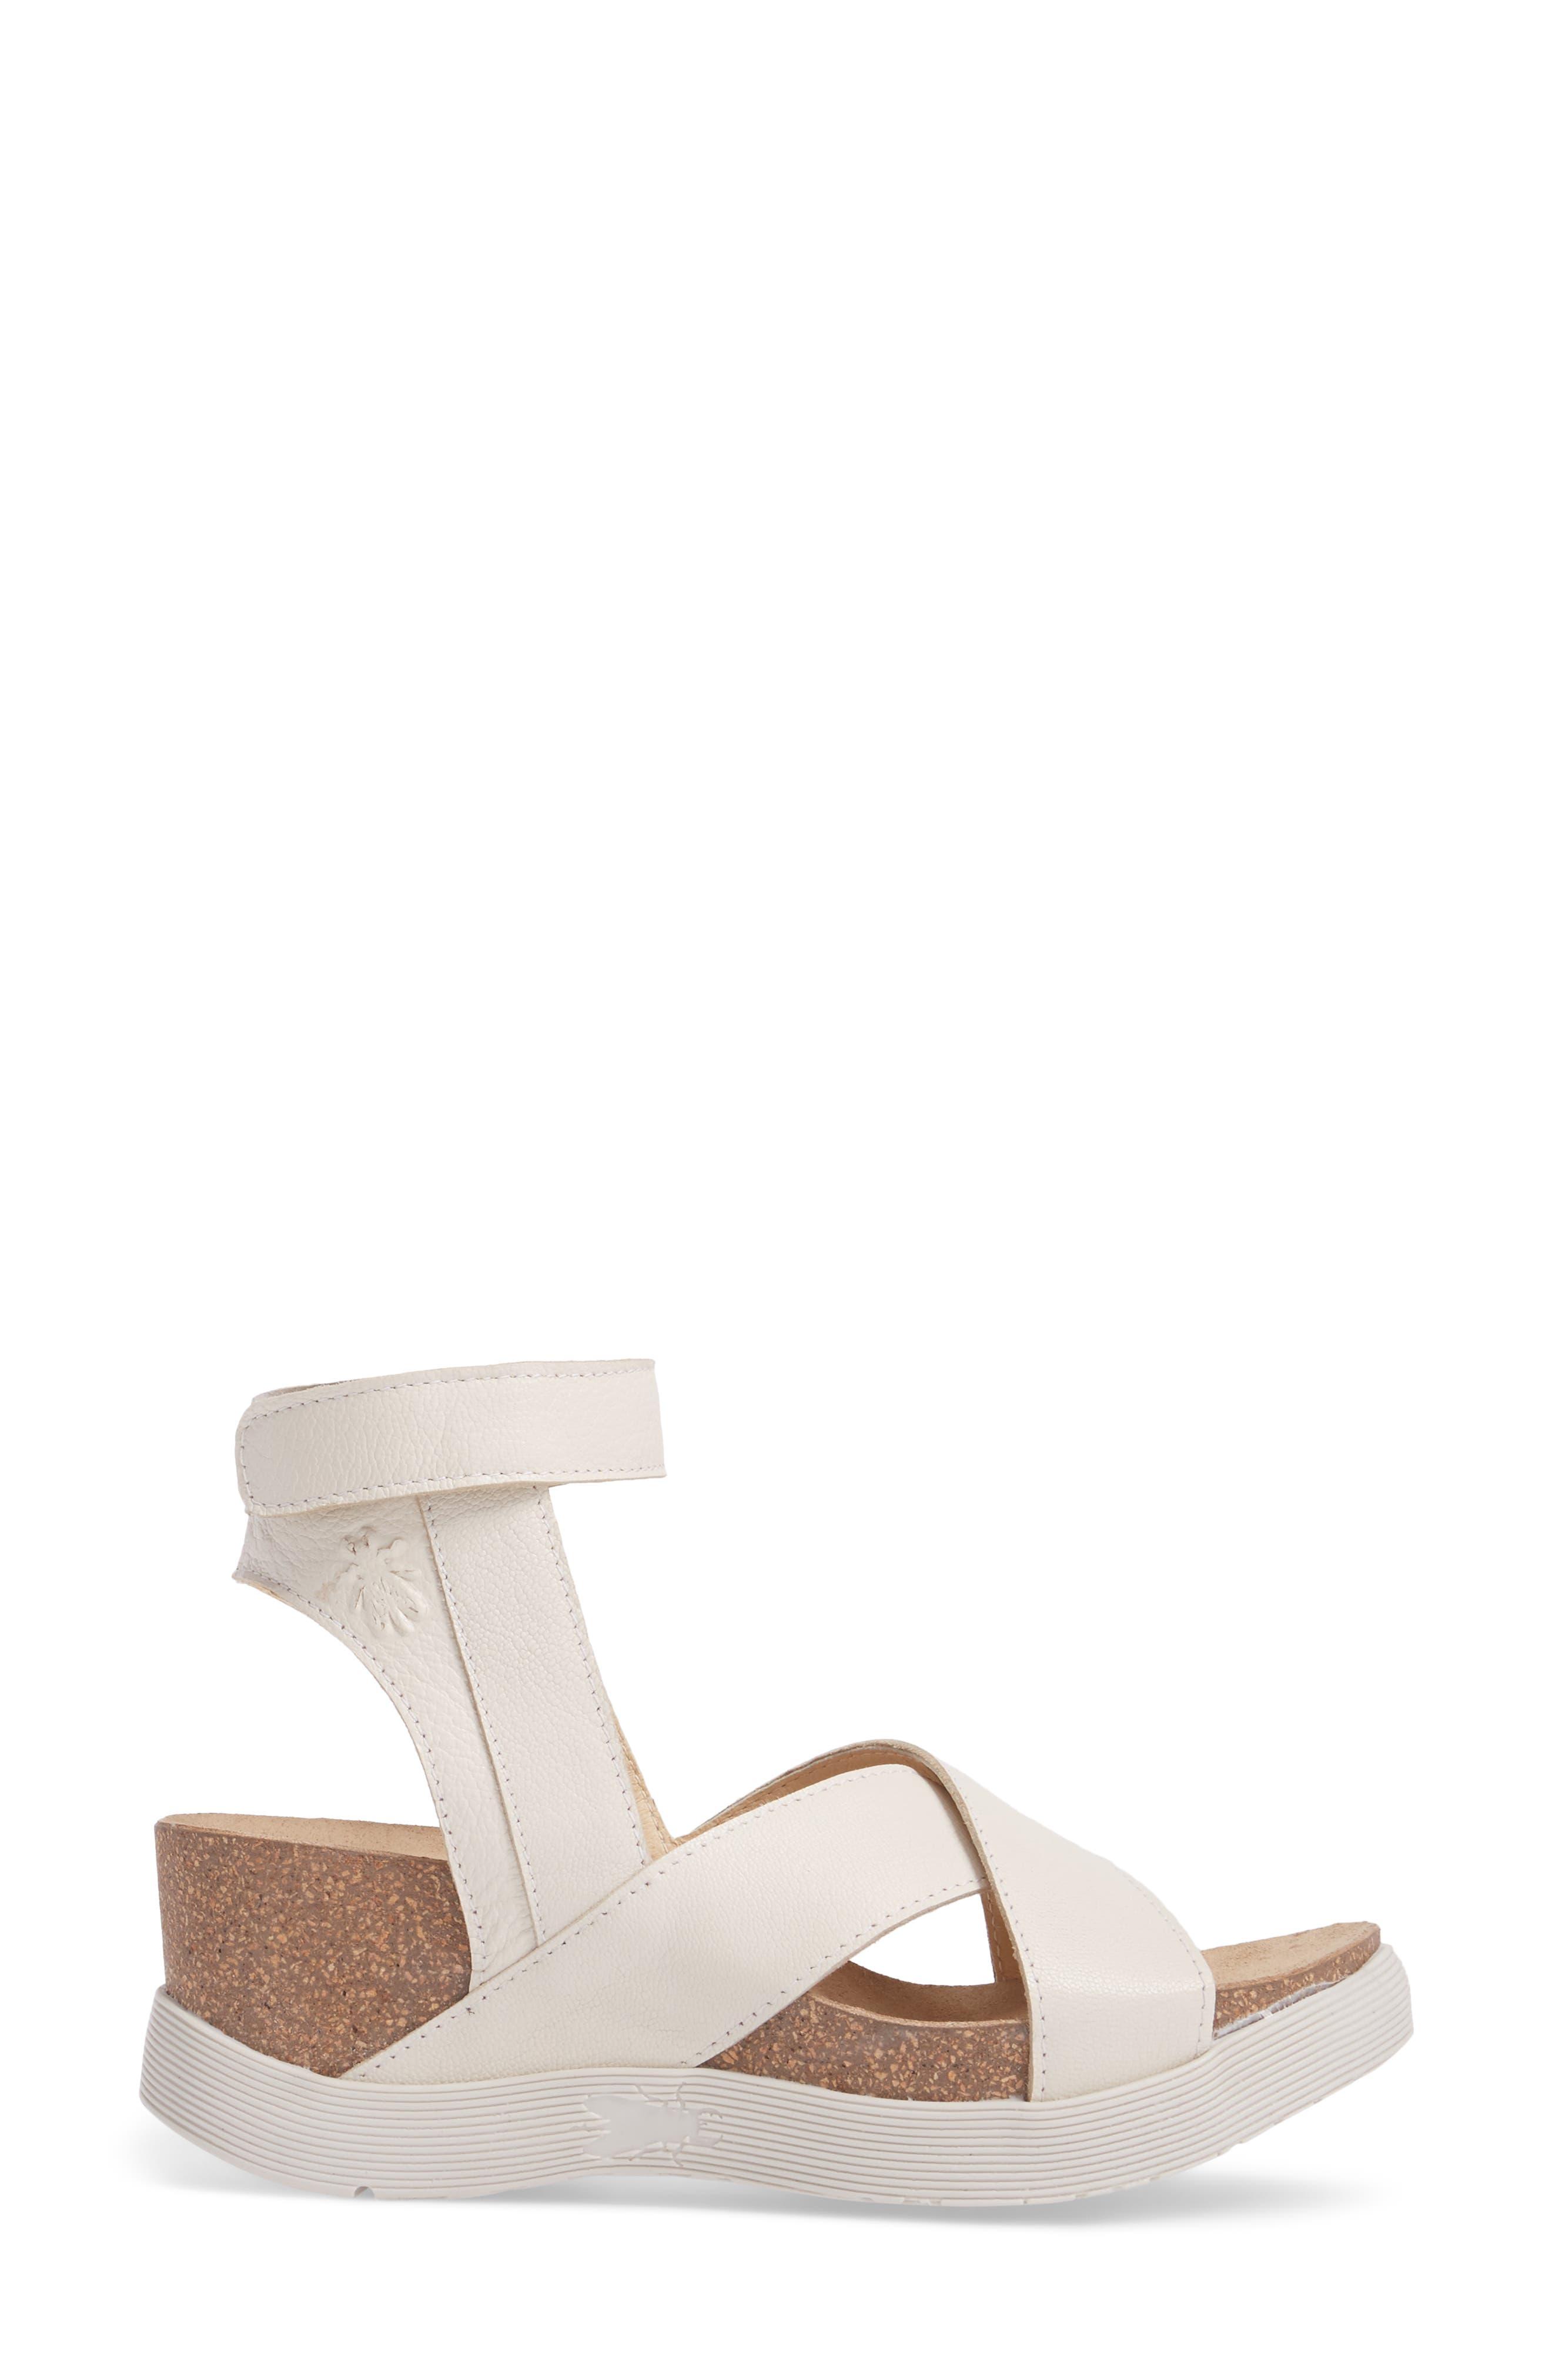 Alternate Image 3  - Fly London Weel Nubuck Leather Platform Sandal (Women)